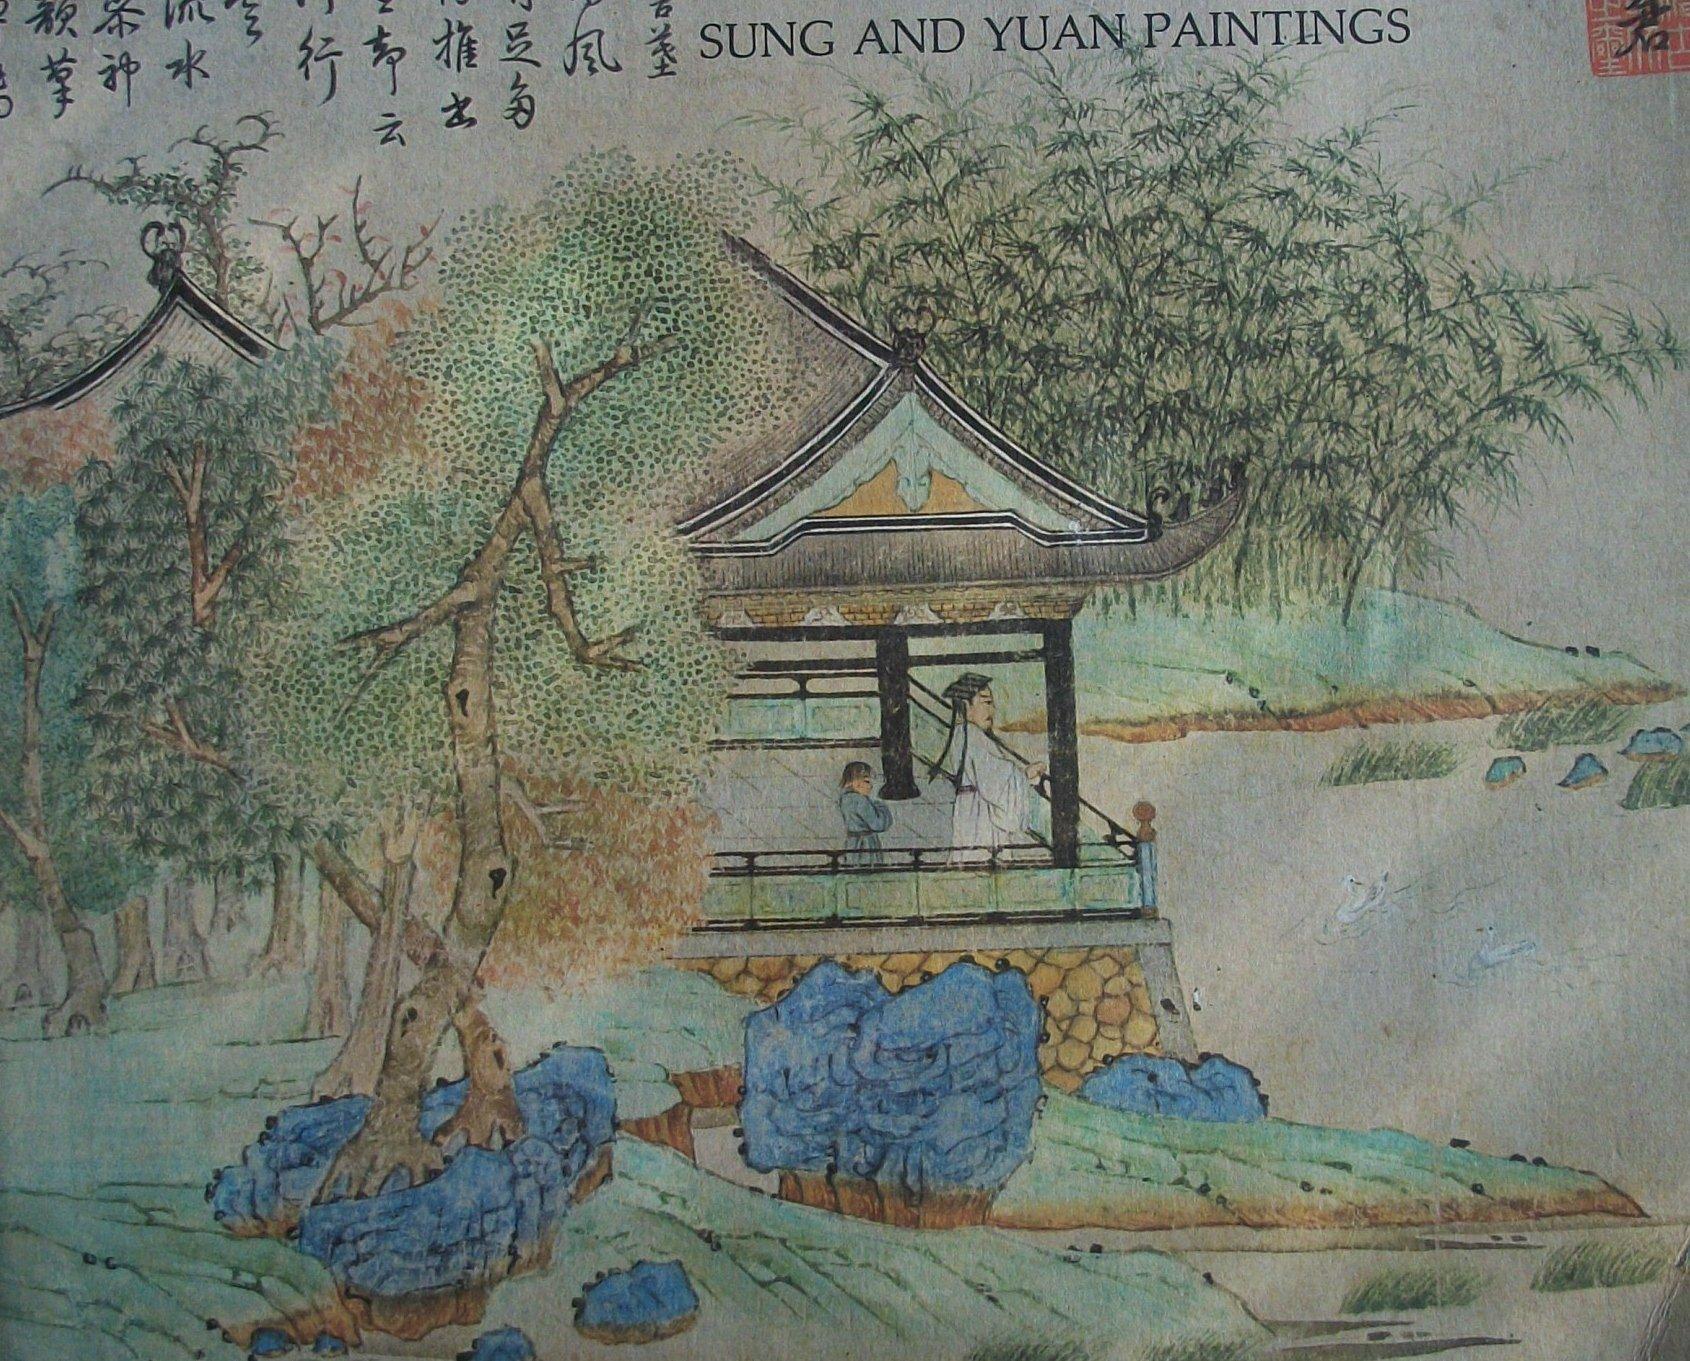 Sung and Yuan paintings: N Y ) Metropolitan Museum of Art (New York